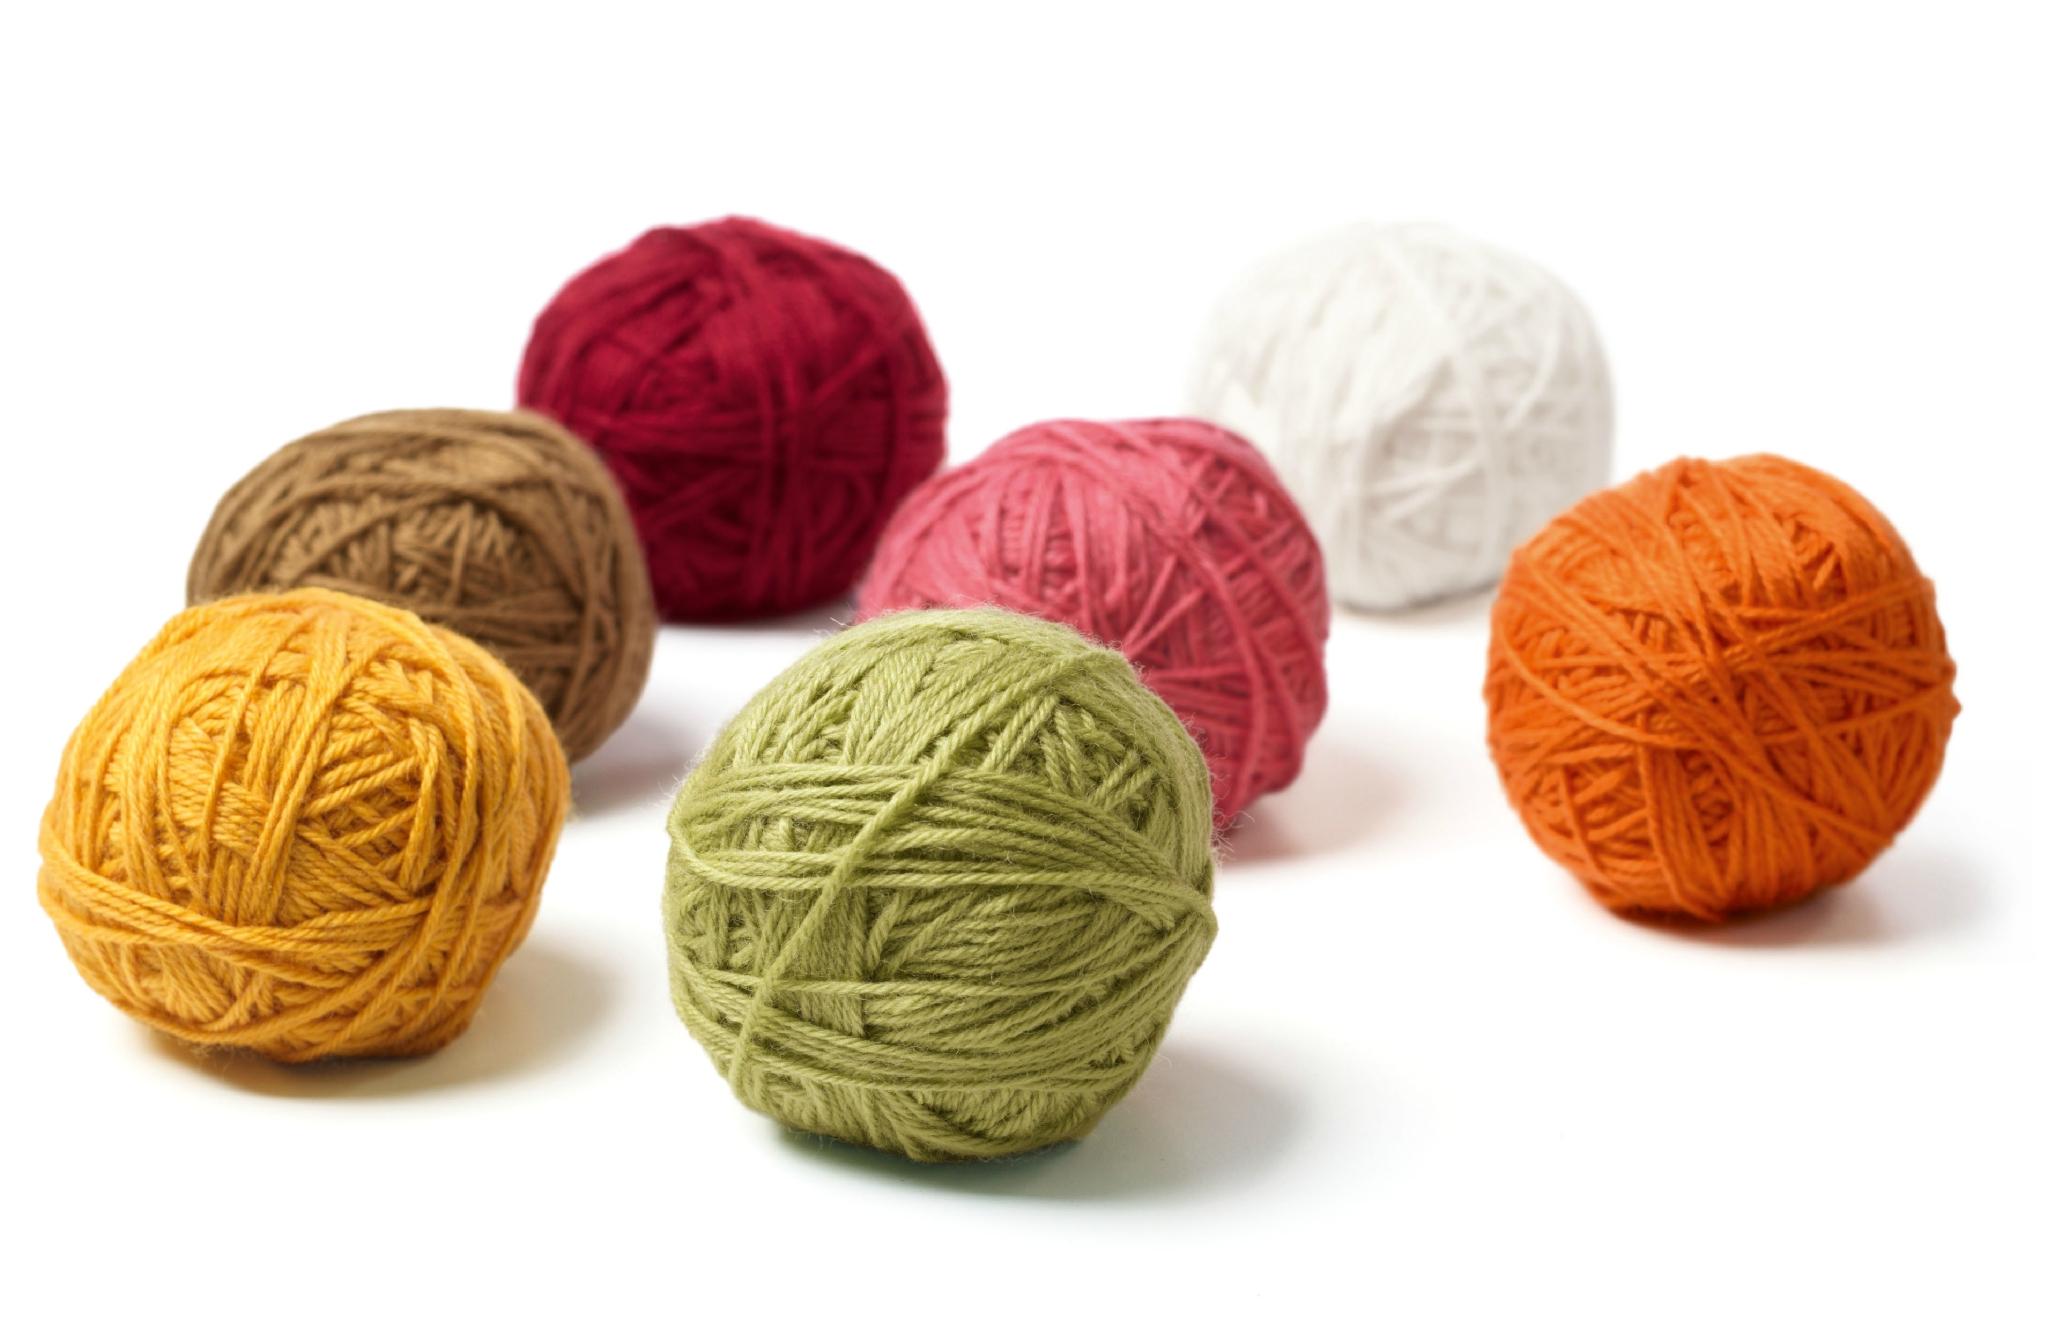 pelote de laine a acheter